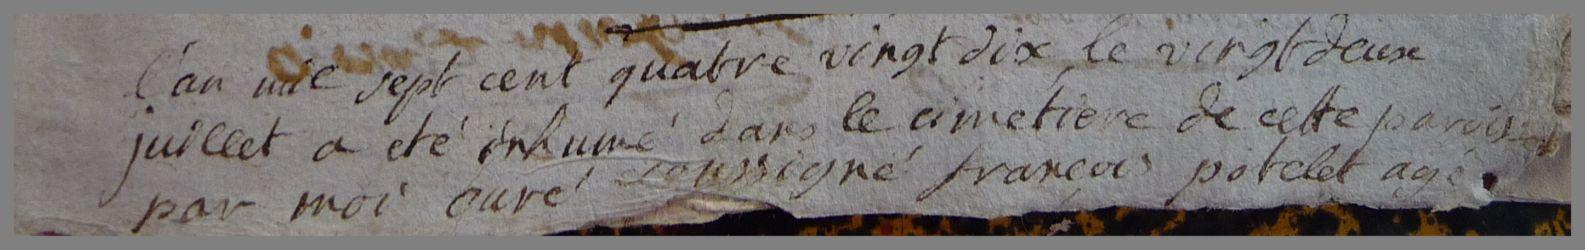 POTELET François dcd 22.07.1790 N°1